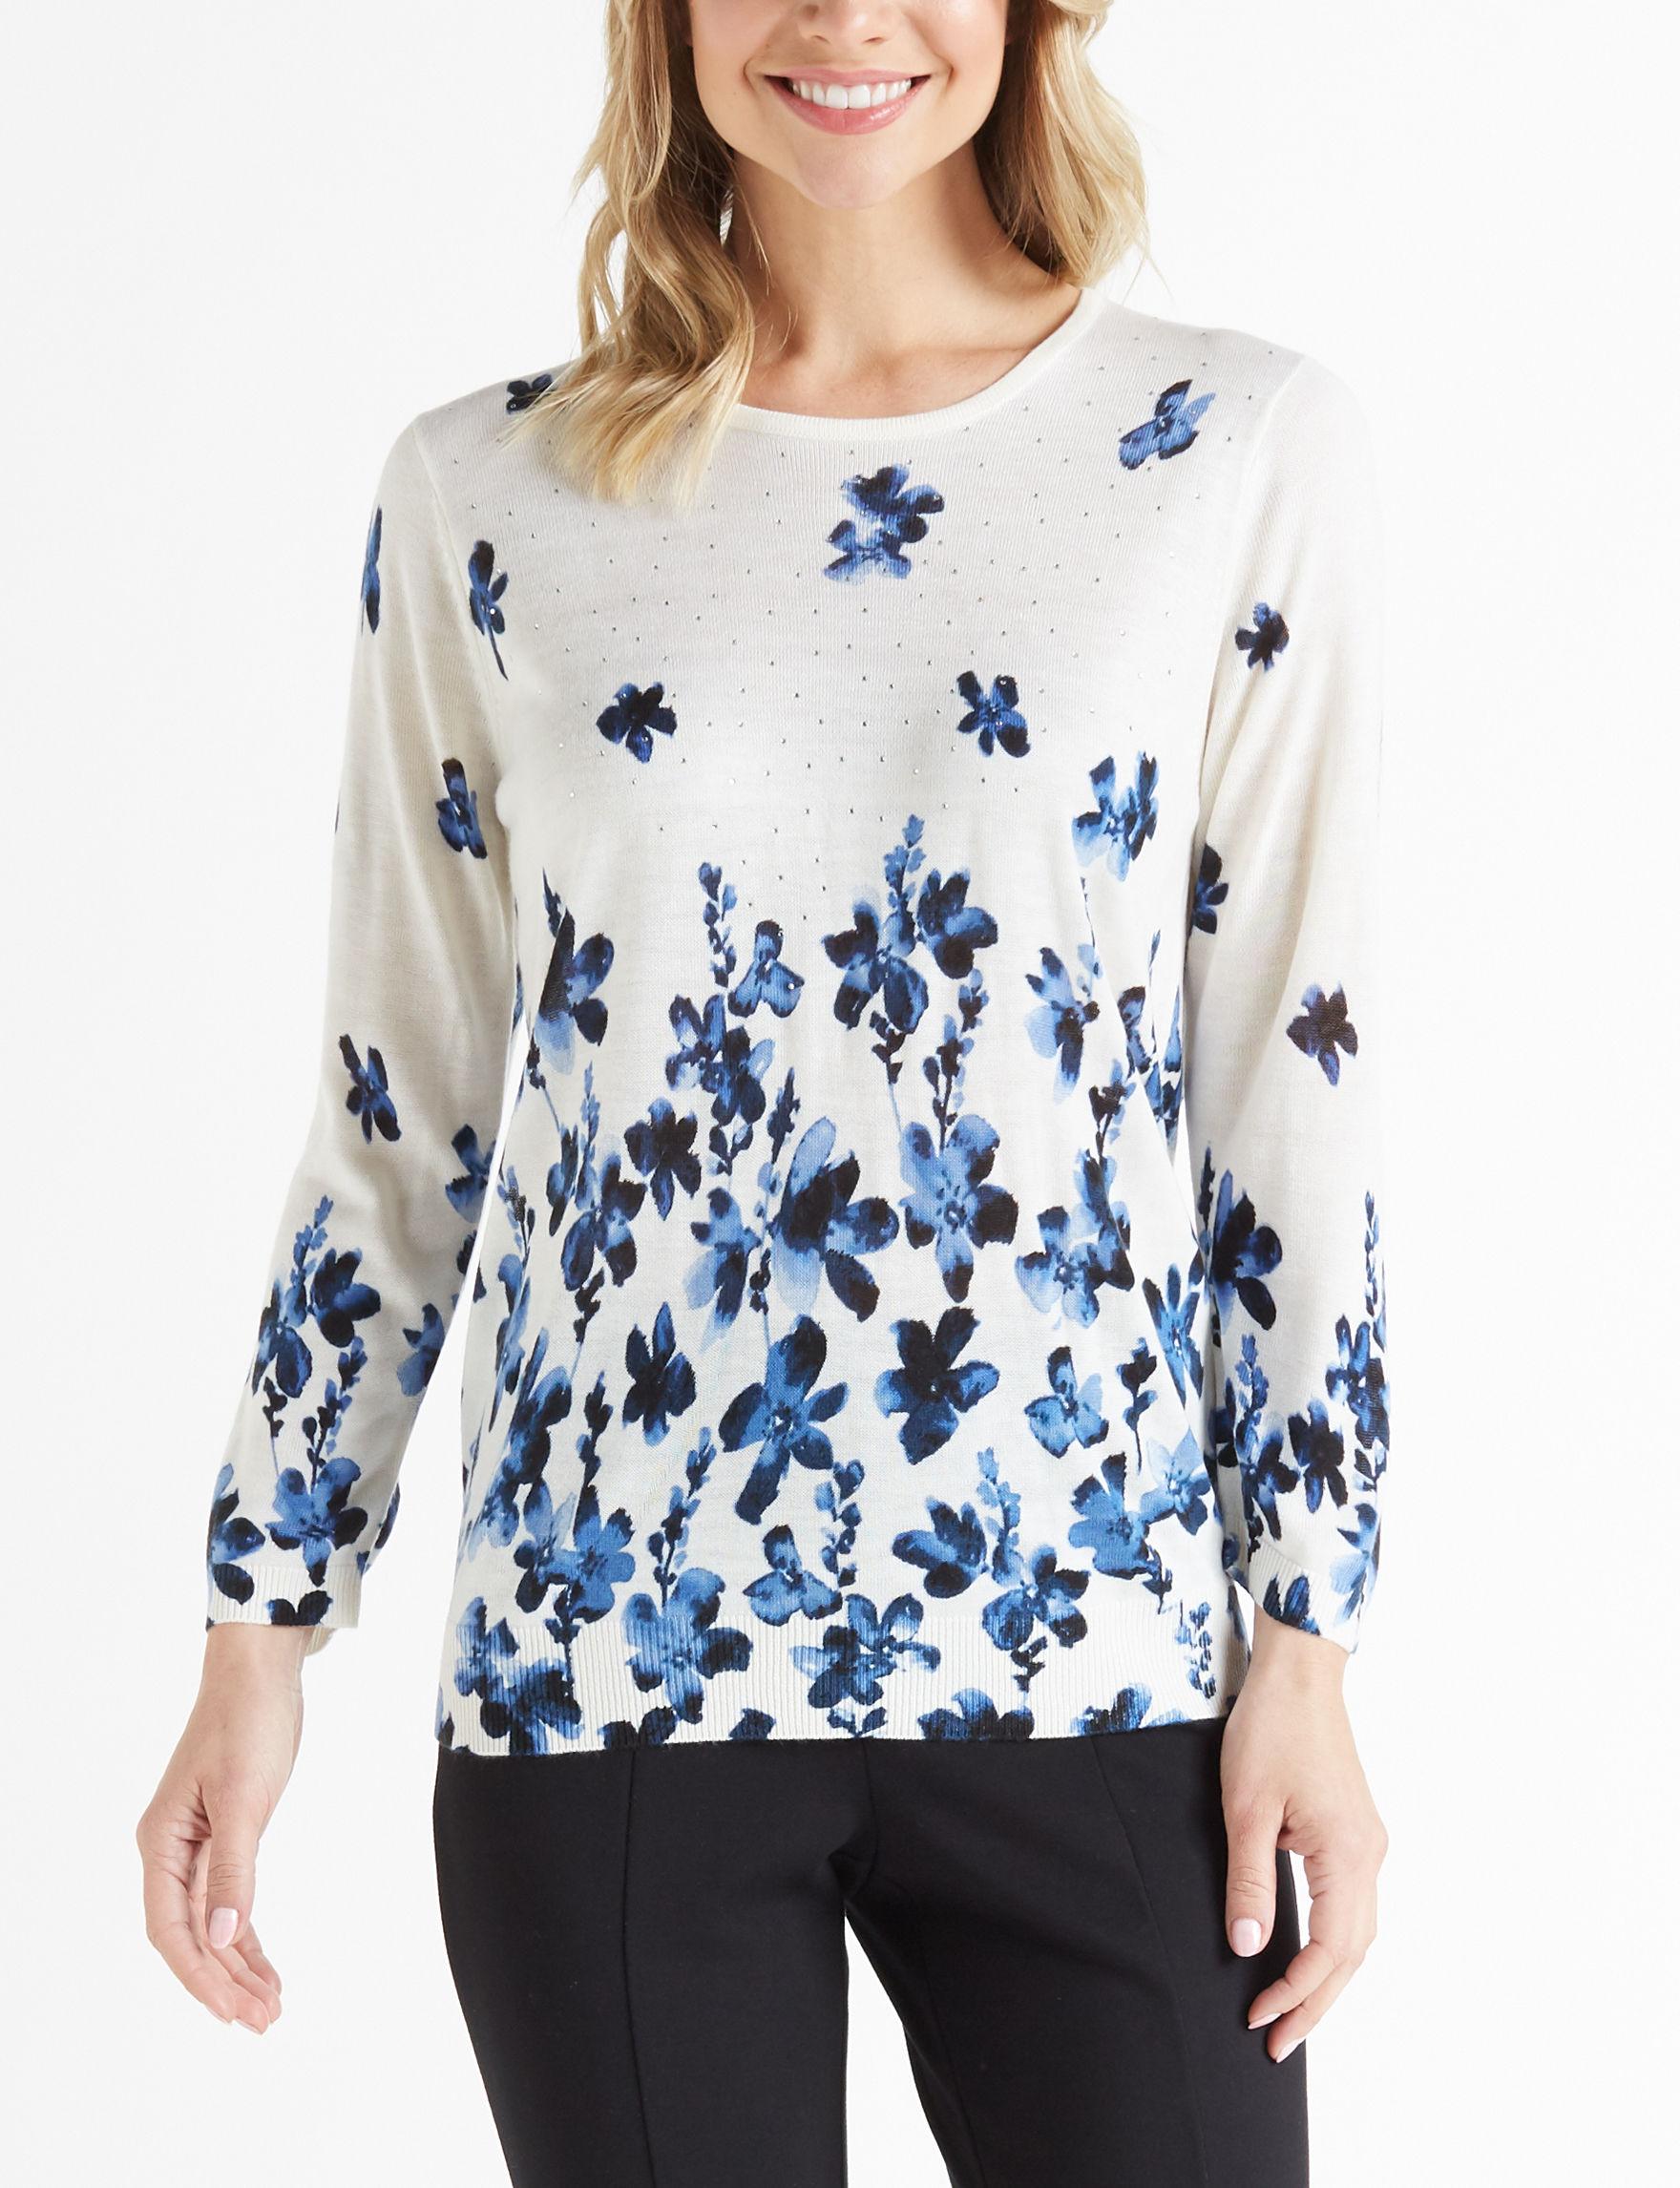 Rebecca Malone White / Blue Shirts & Blouses